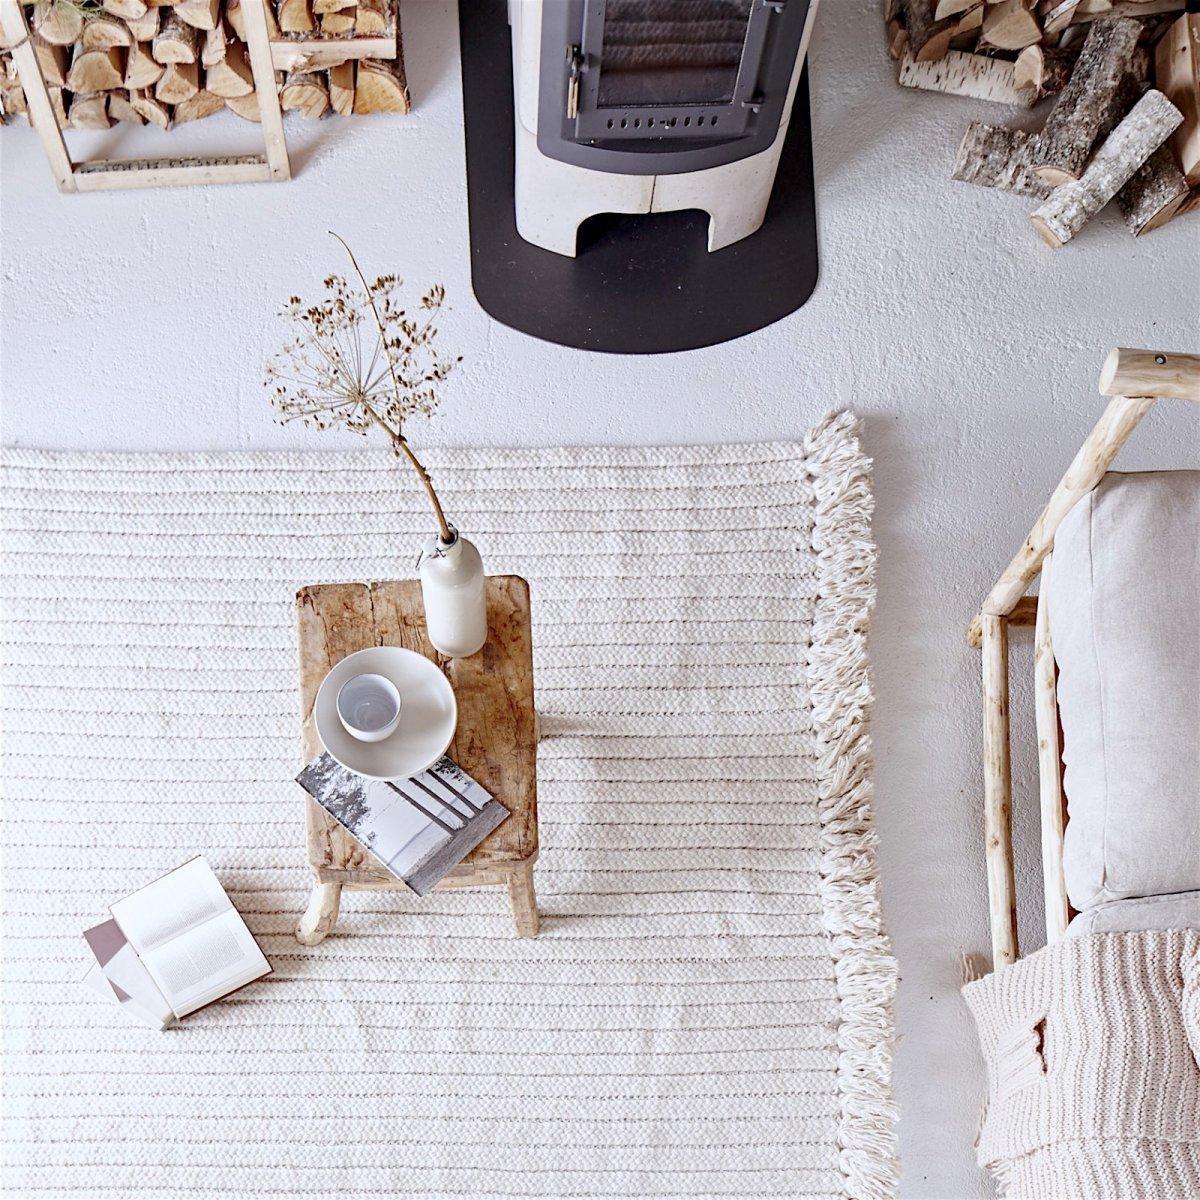 Chulto-Carpet-1600x1600